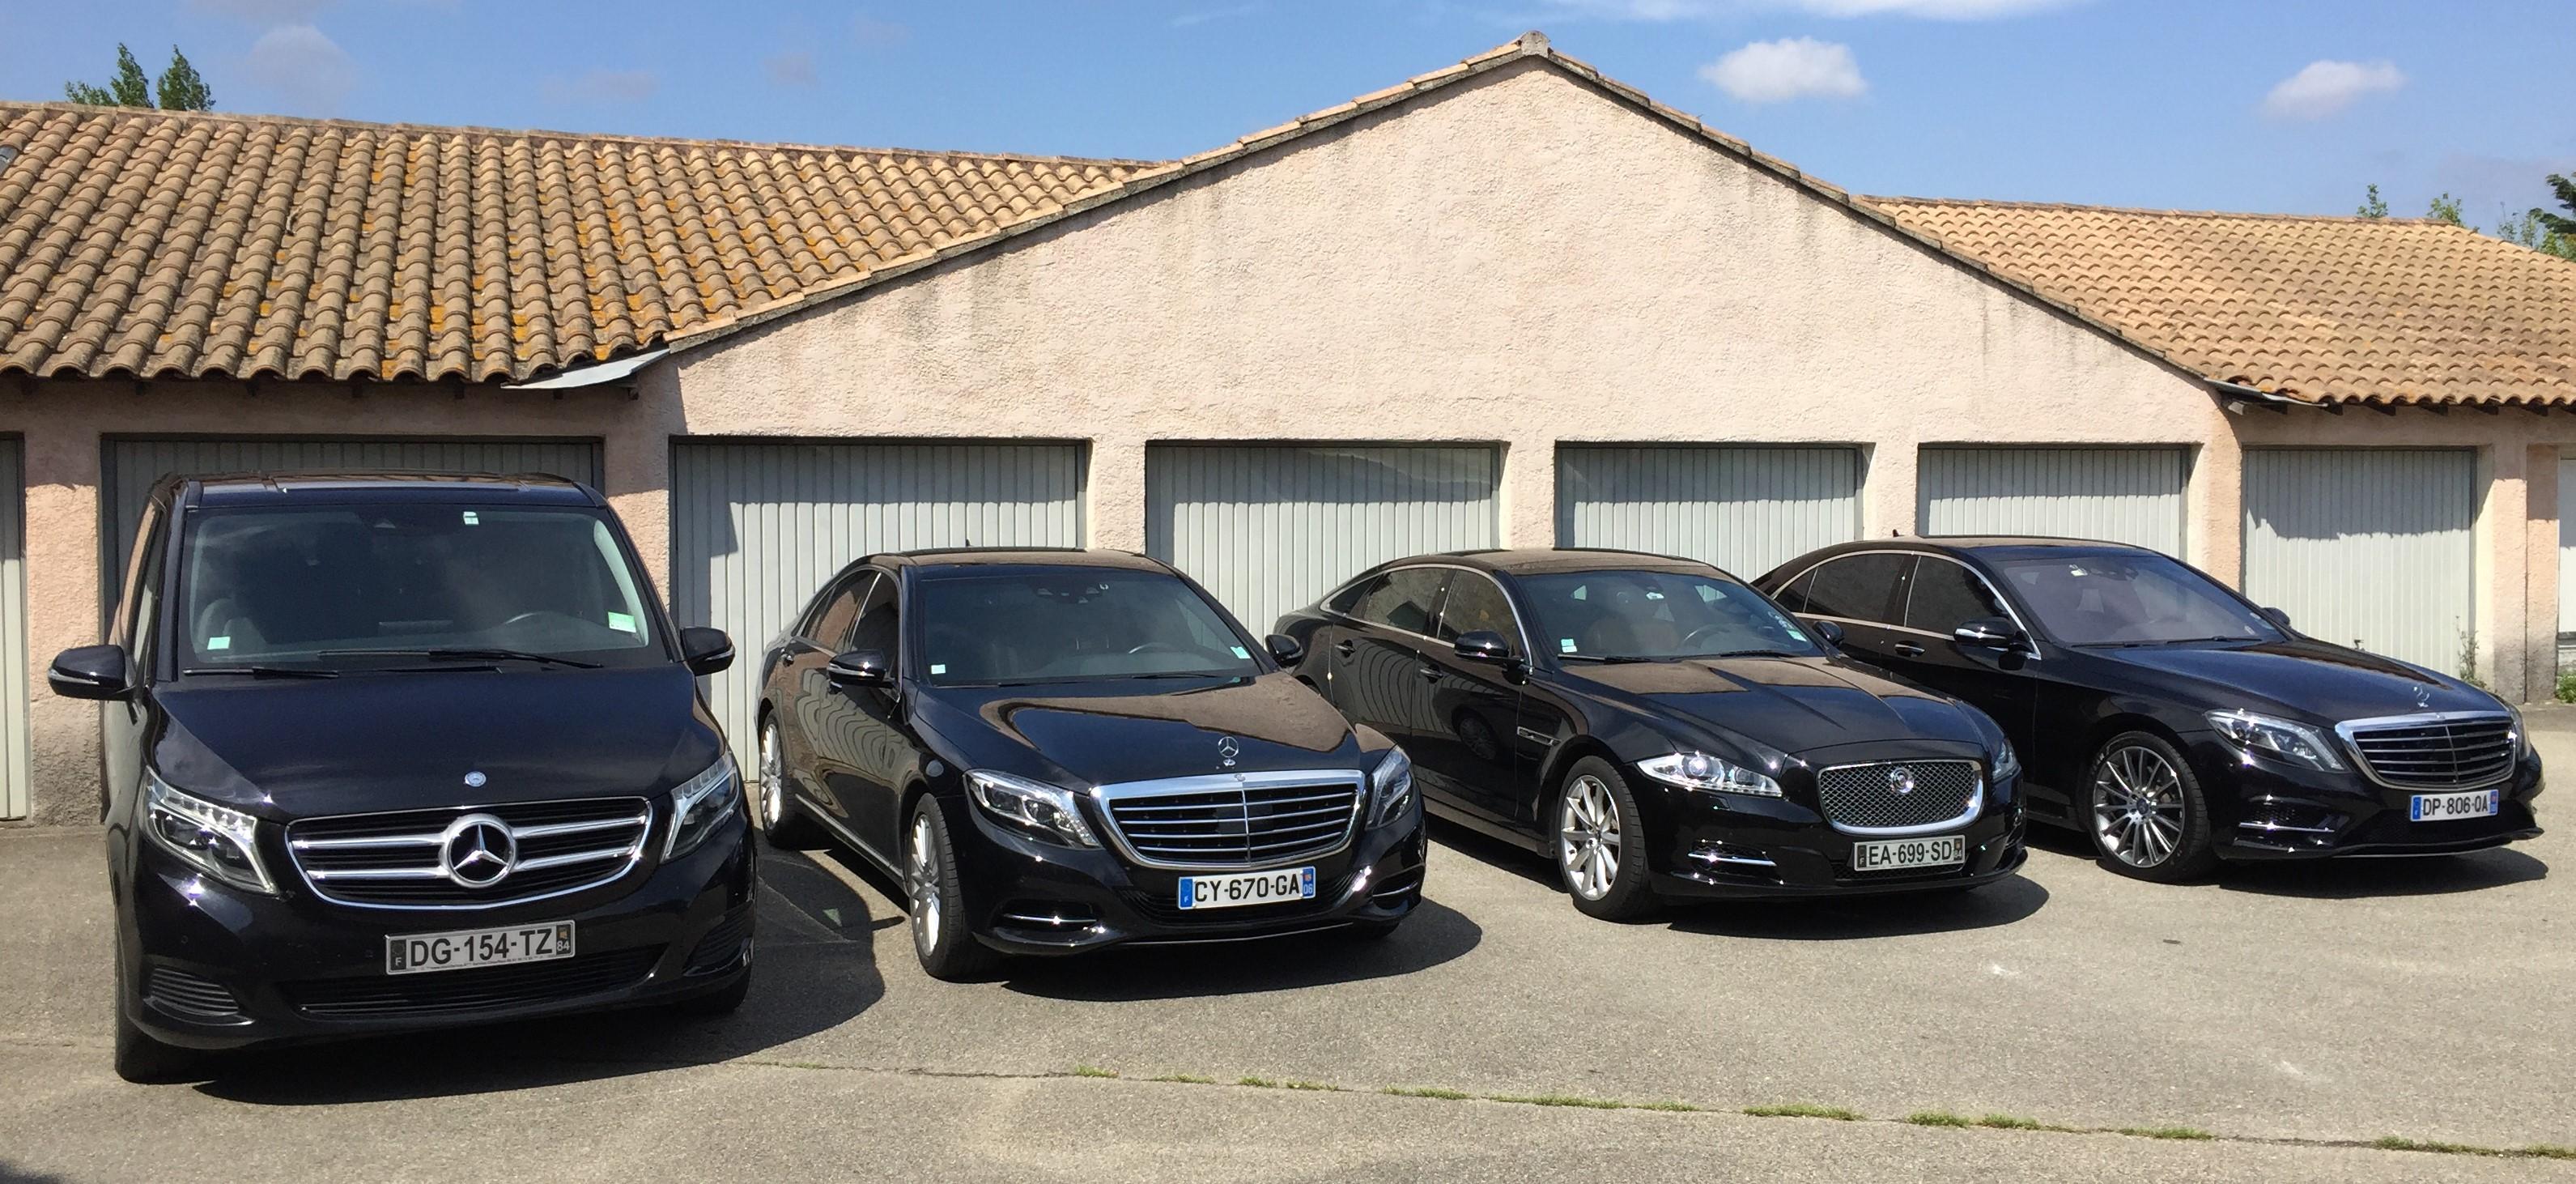 Voiture avec Chauffeur Montpellier